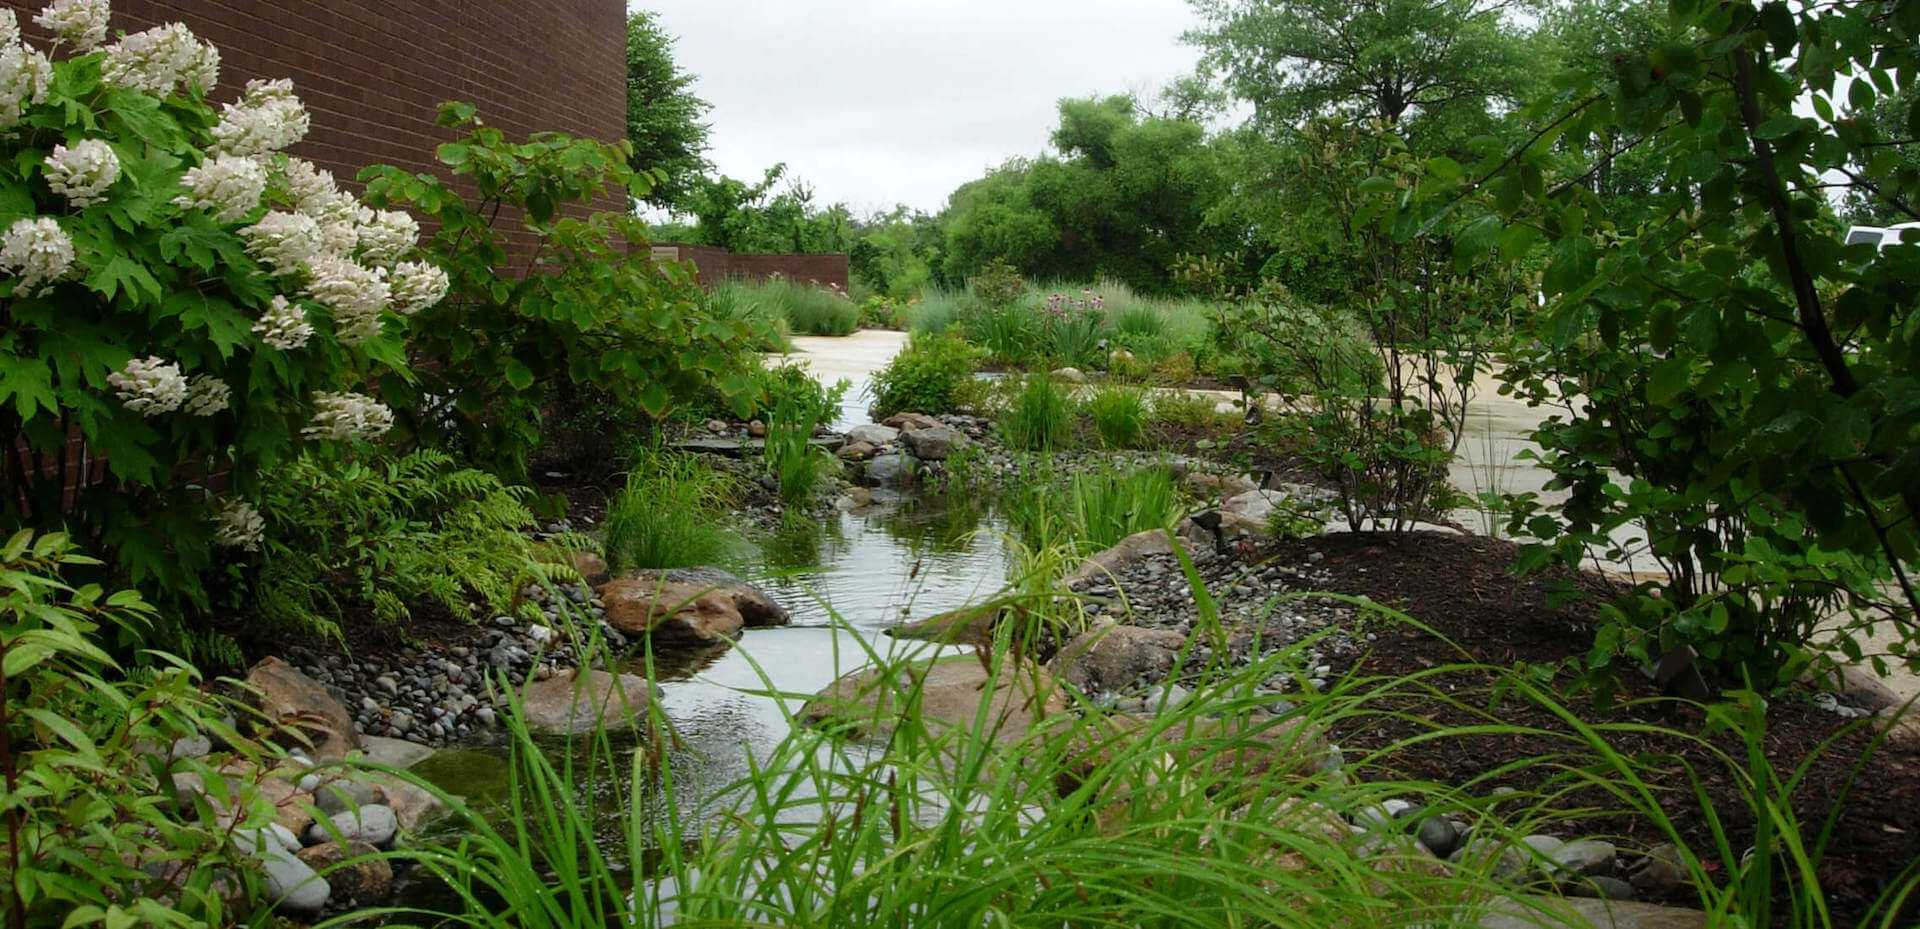 small river flowing through landsacape